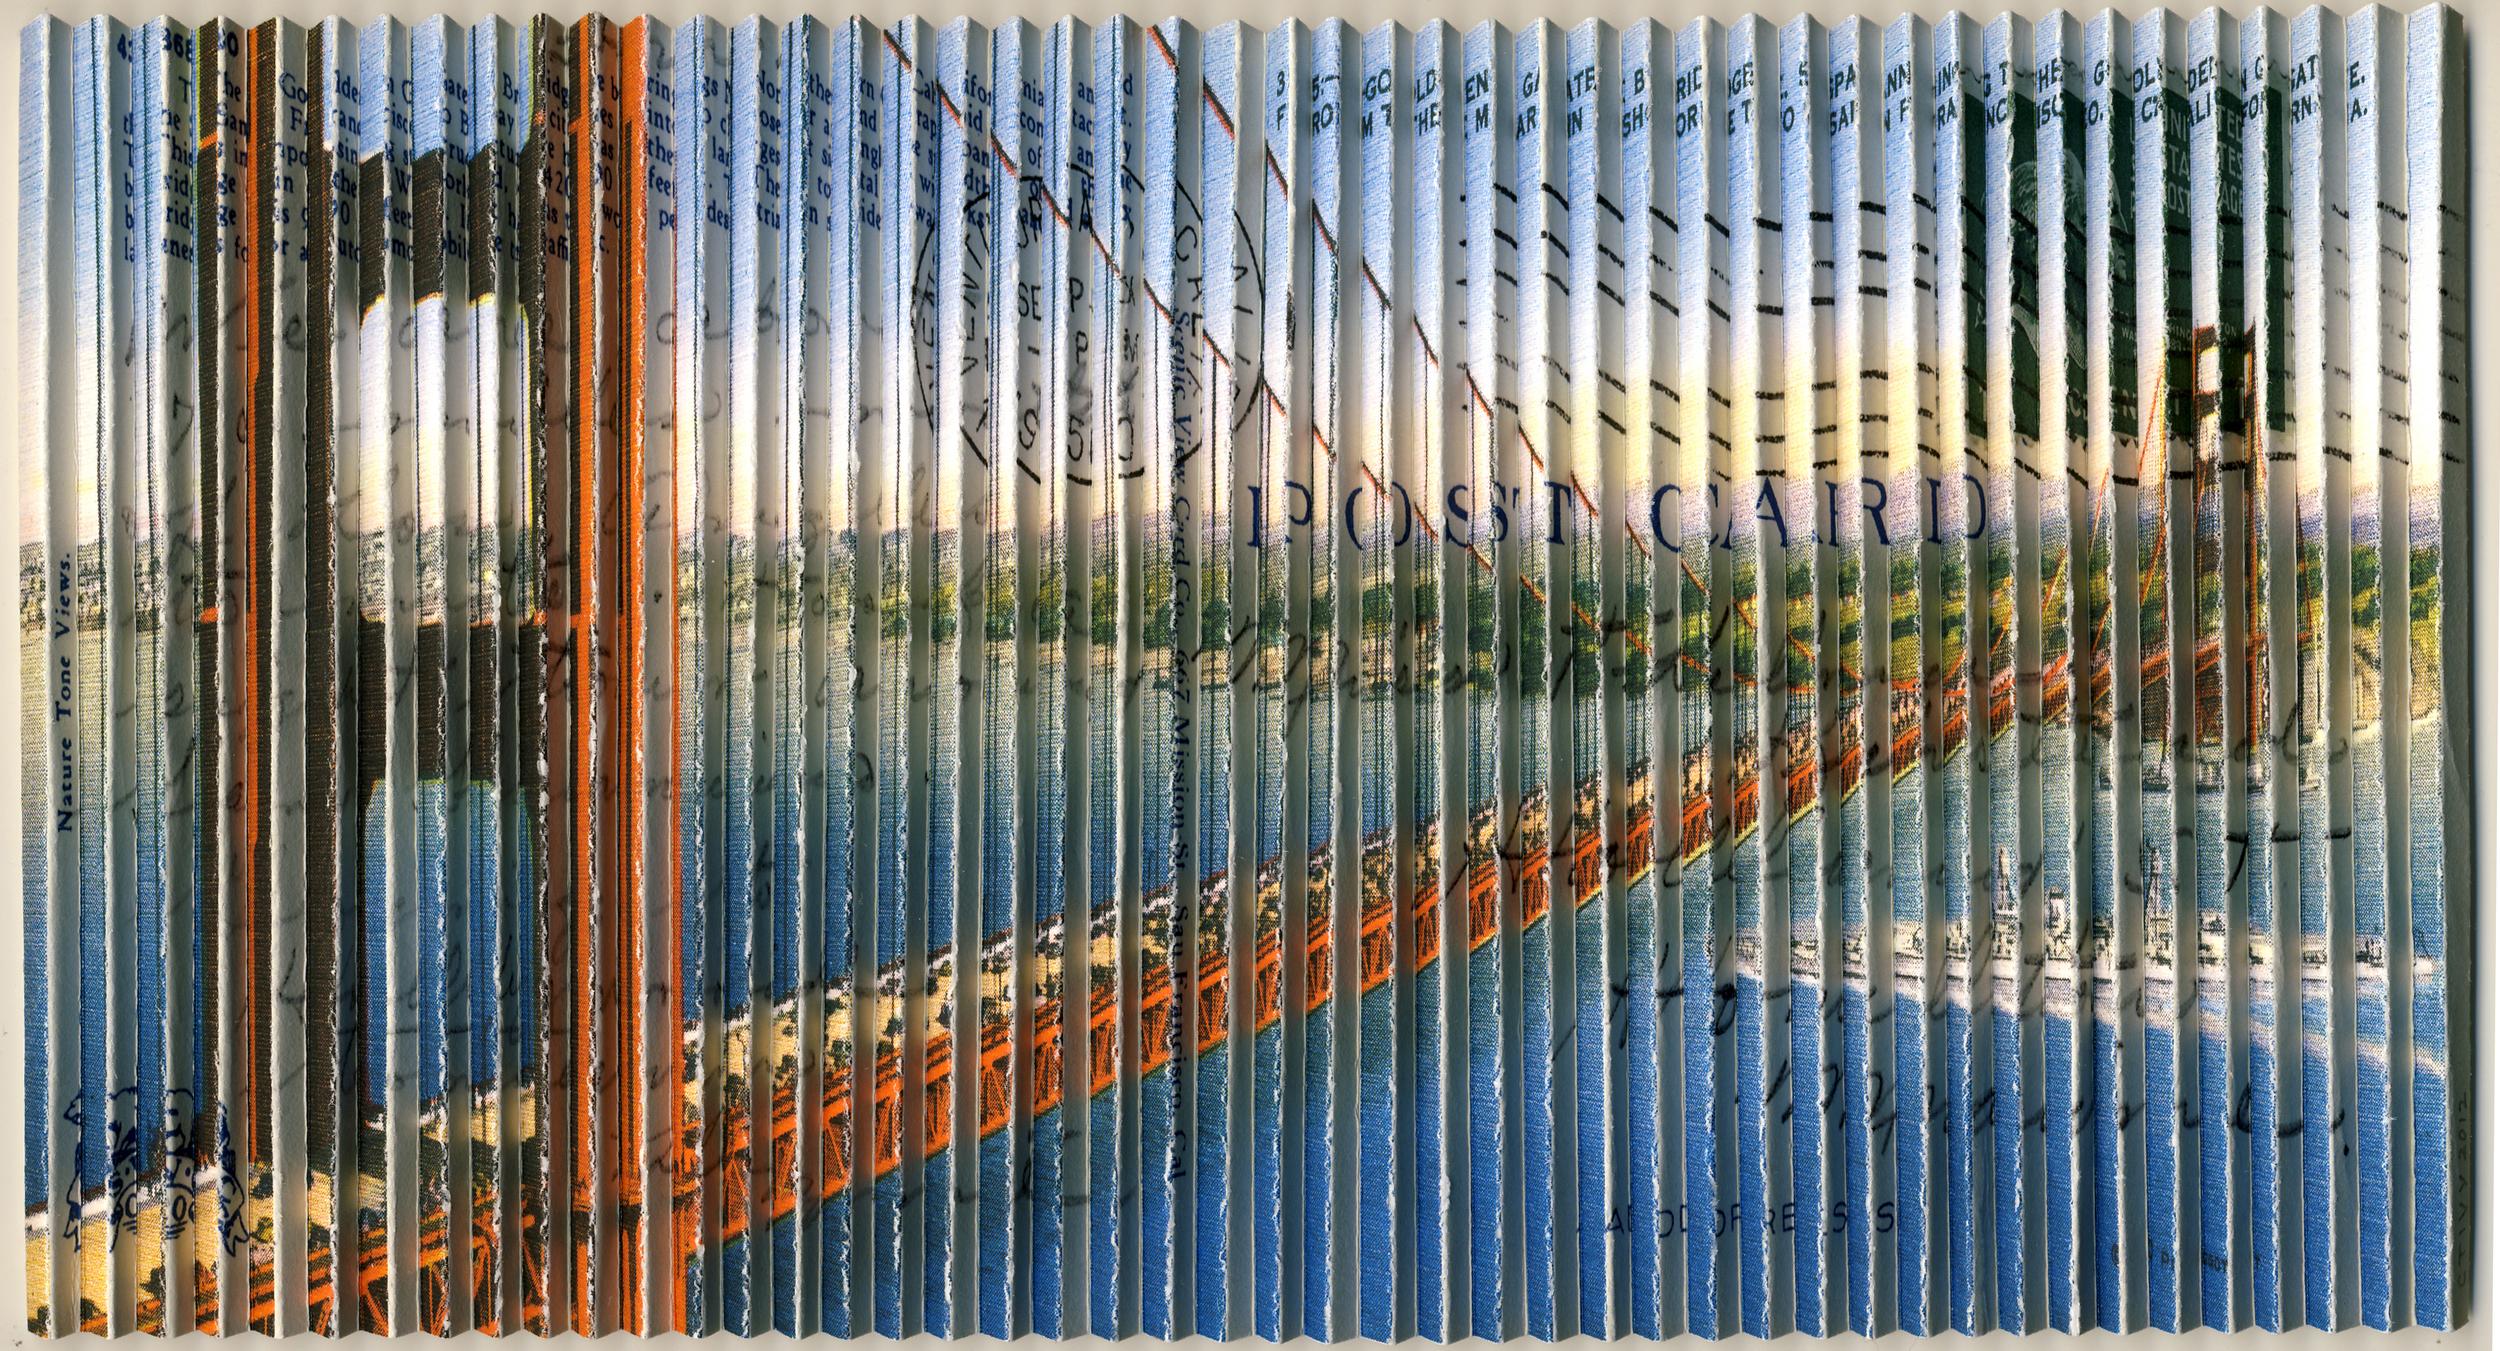 Golden Gate Bridge, San Francisco • September 30, 1950